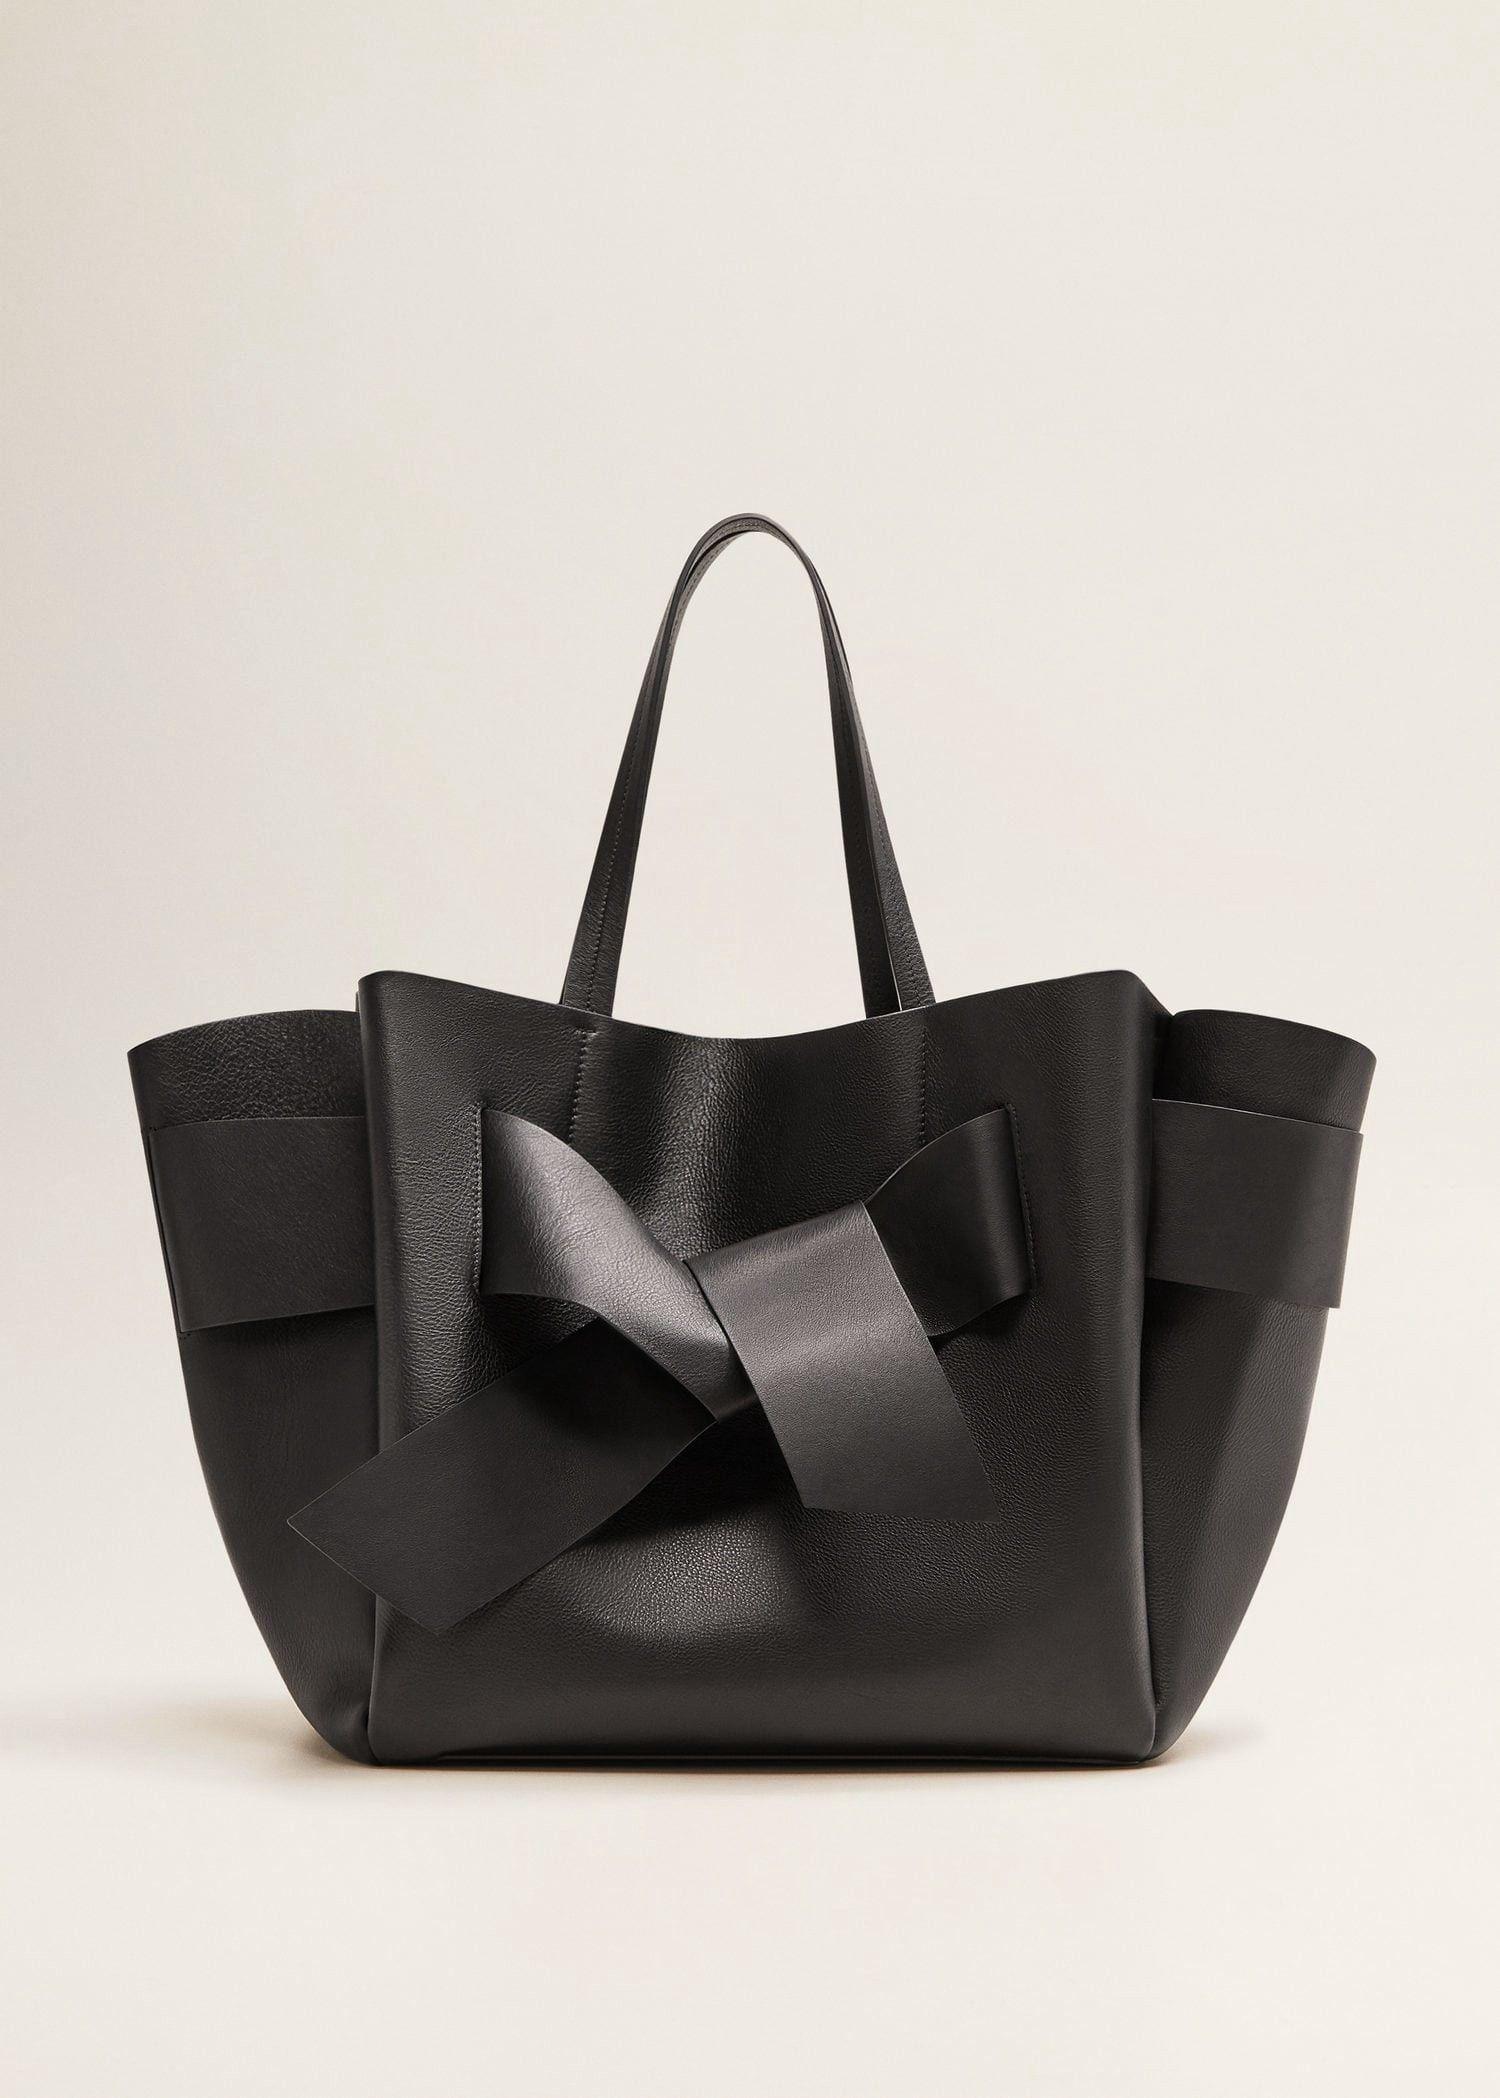 Mango Leather Shopper Bag Black One Size in 2019 | Shopper